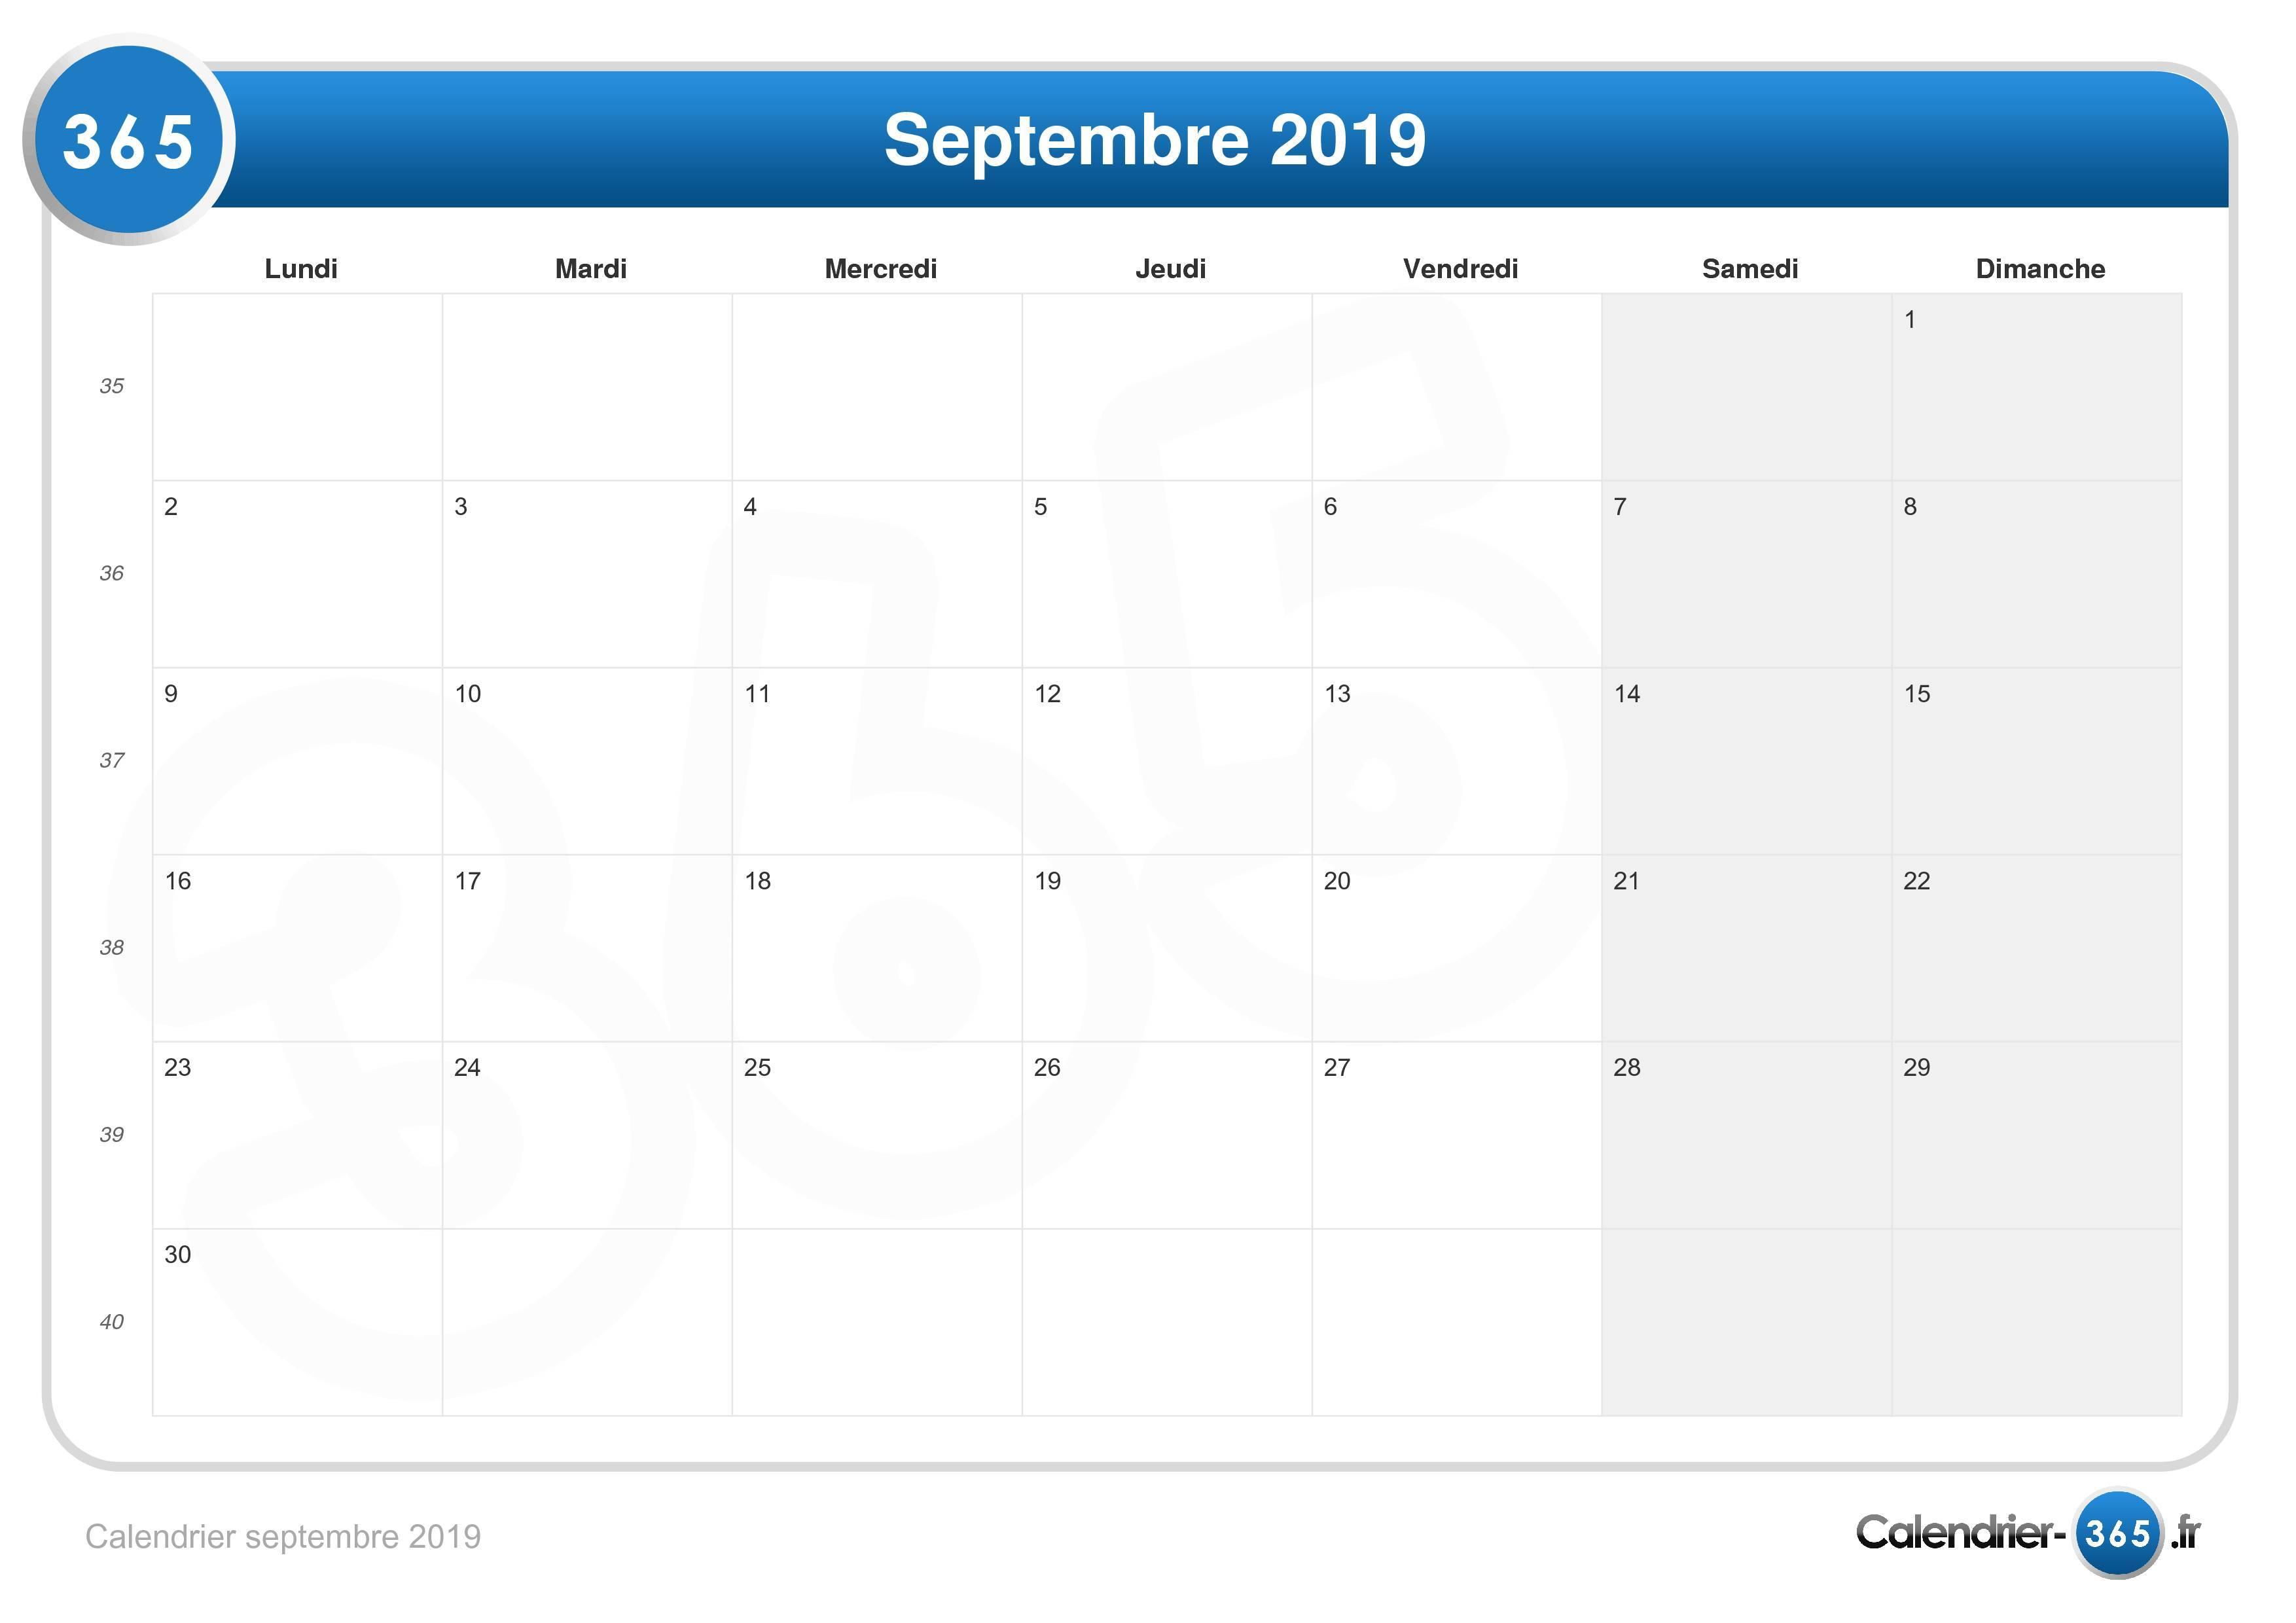 Calendrier Septembre 2019 A Aout 2020.Calendrier Septembre 2019